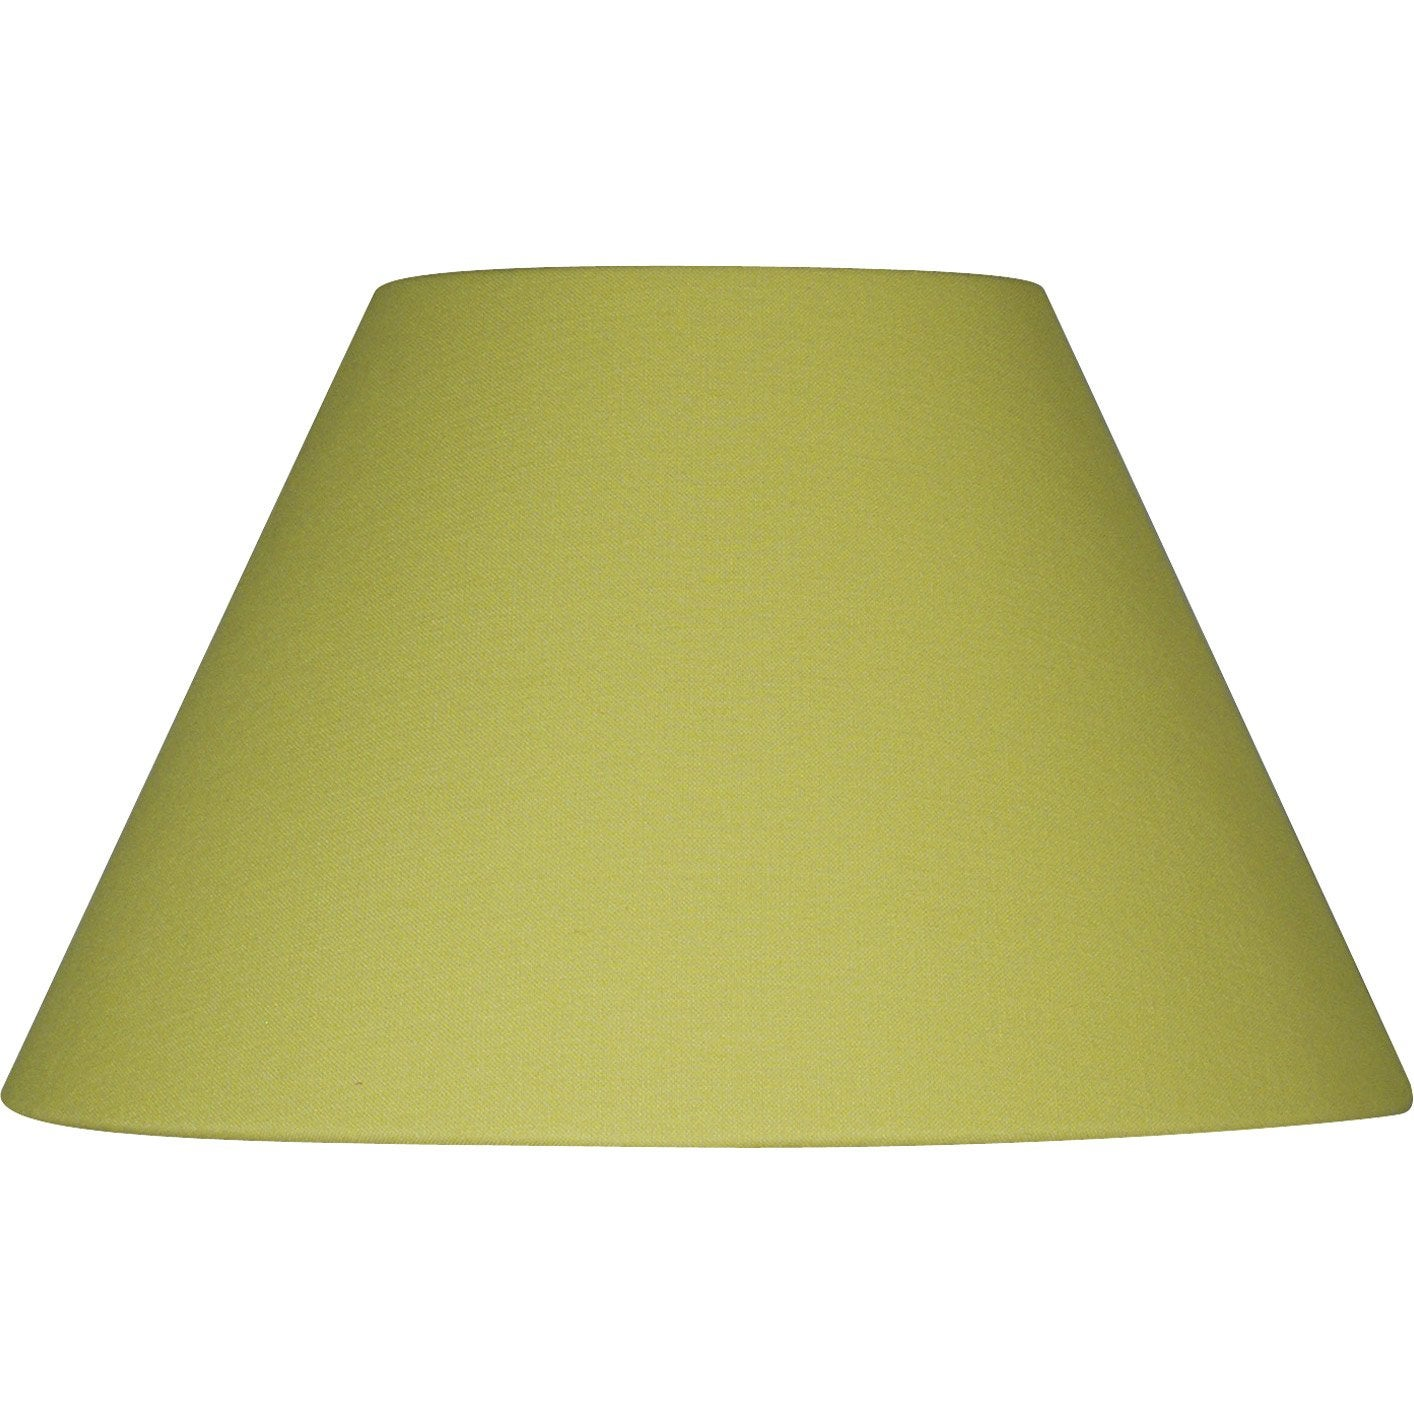 abat jour sweet 19 cm coton anis inspire leroy merlin. Black Bedroom Furniture Sets. Home Design Ideas